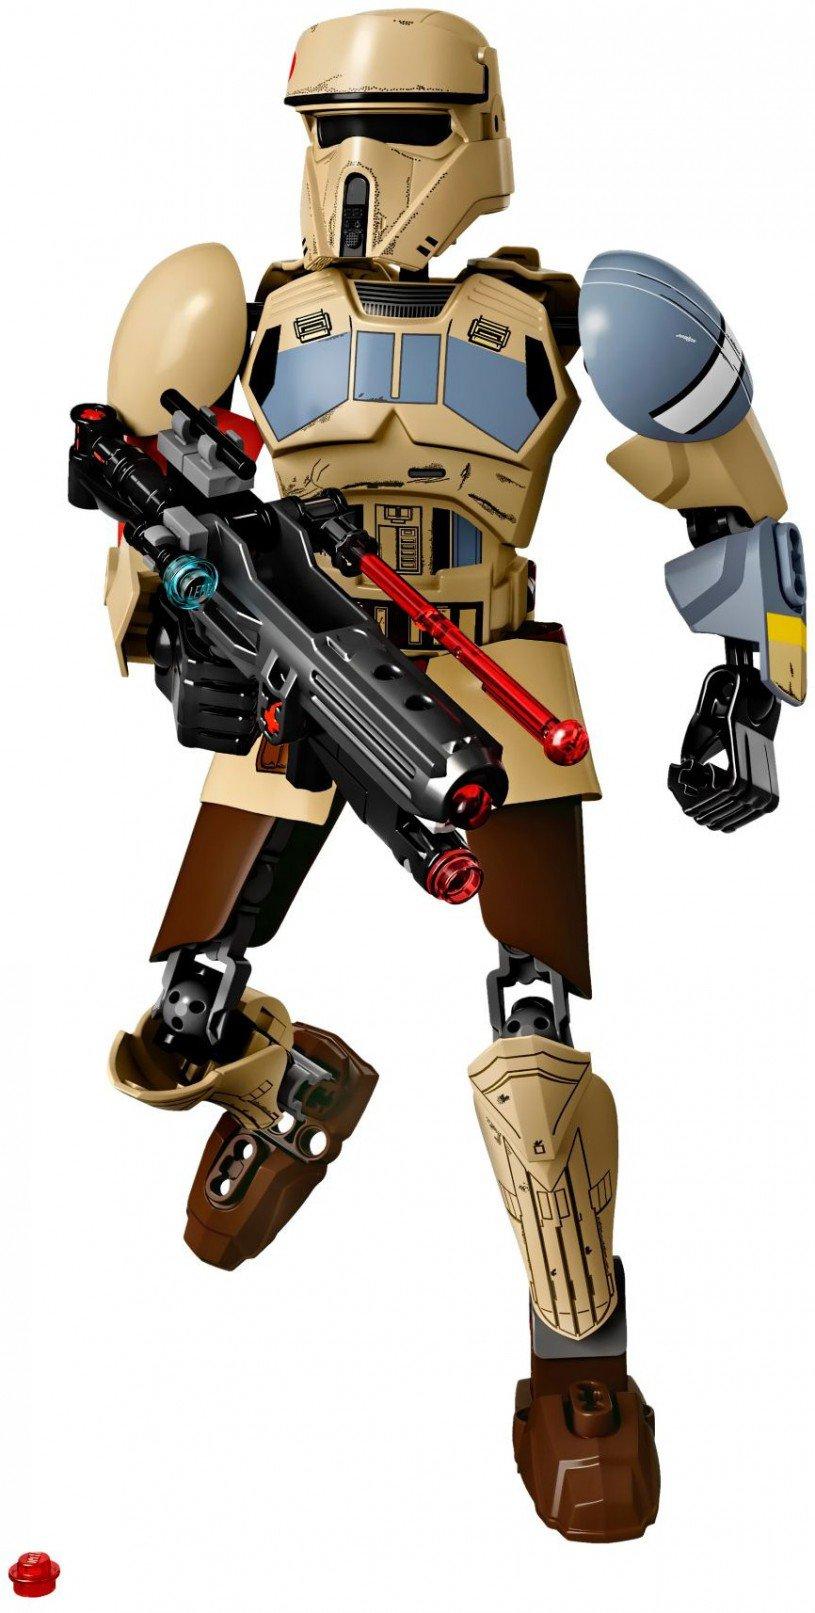 LEGO 75523 Star Wars: Scarif Stormtrooper